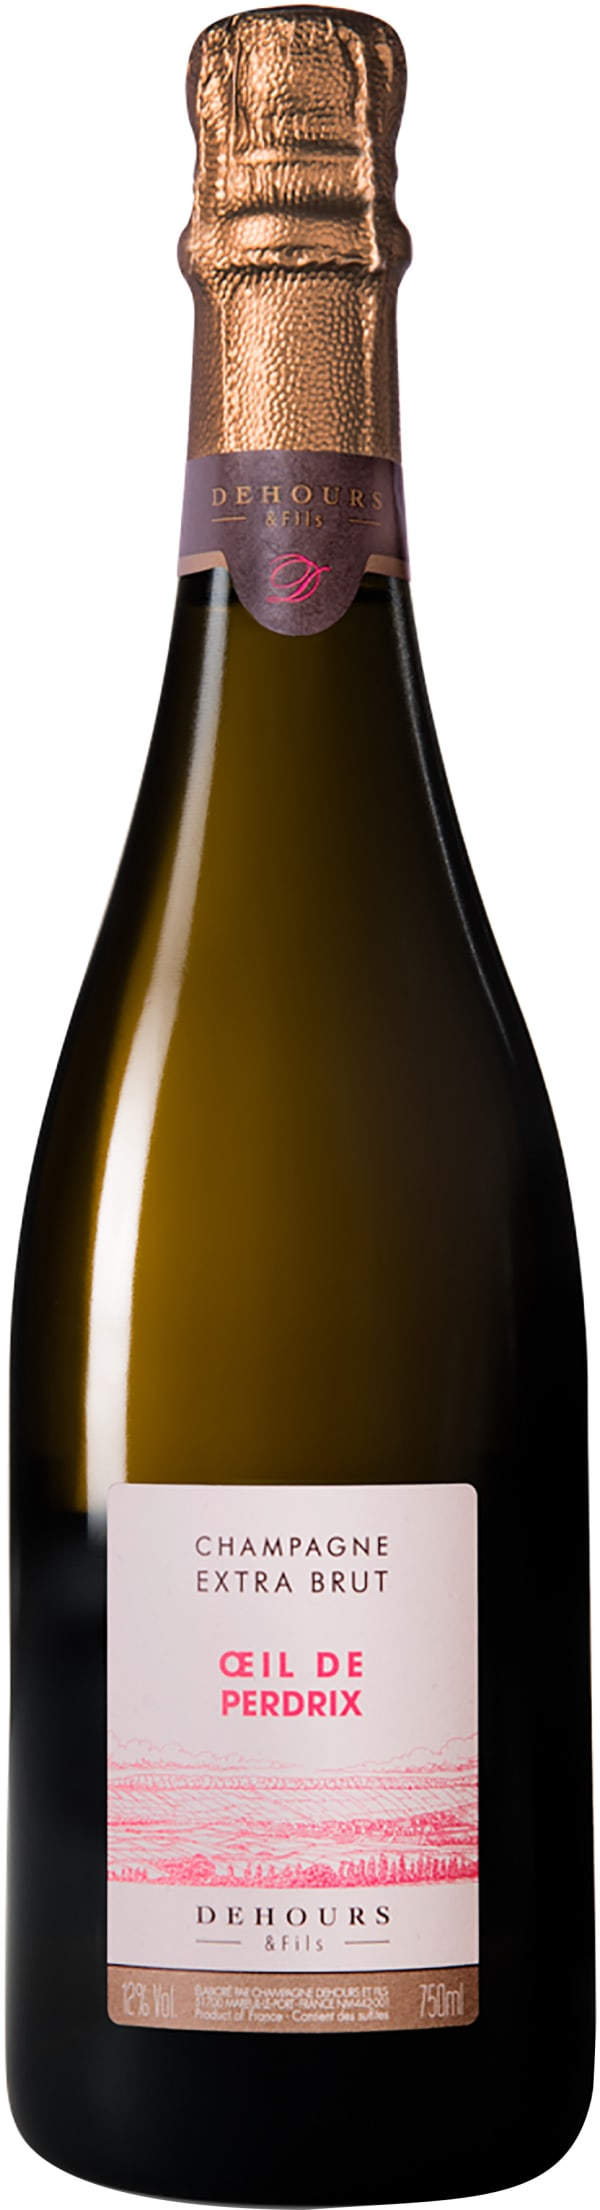 Dehours & Fils Oeil de Perdrix Champagne Extra Brut